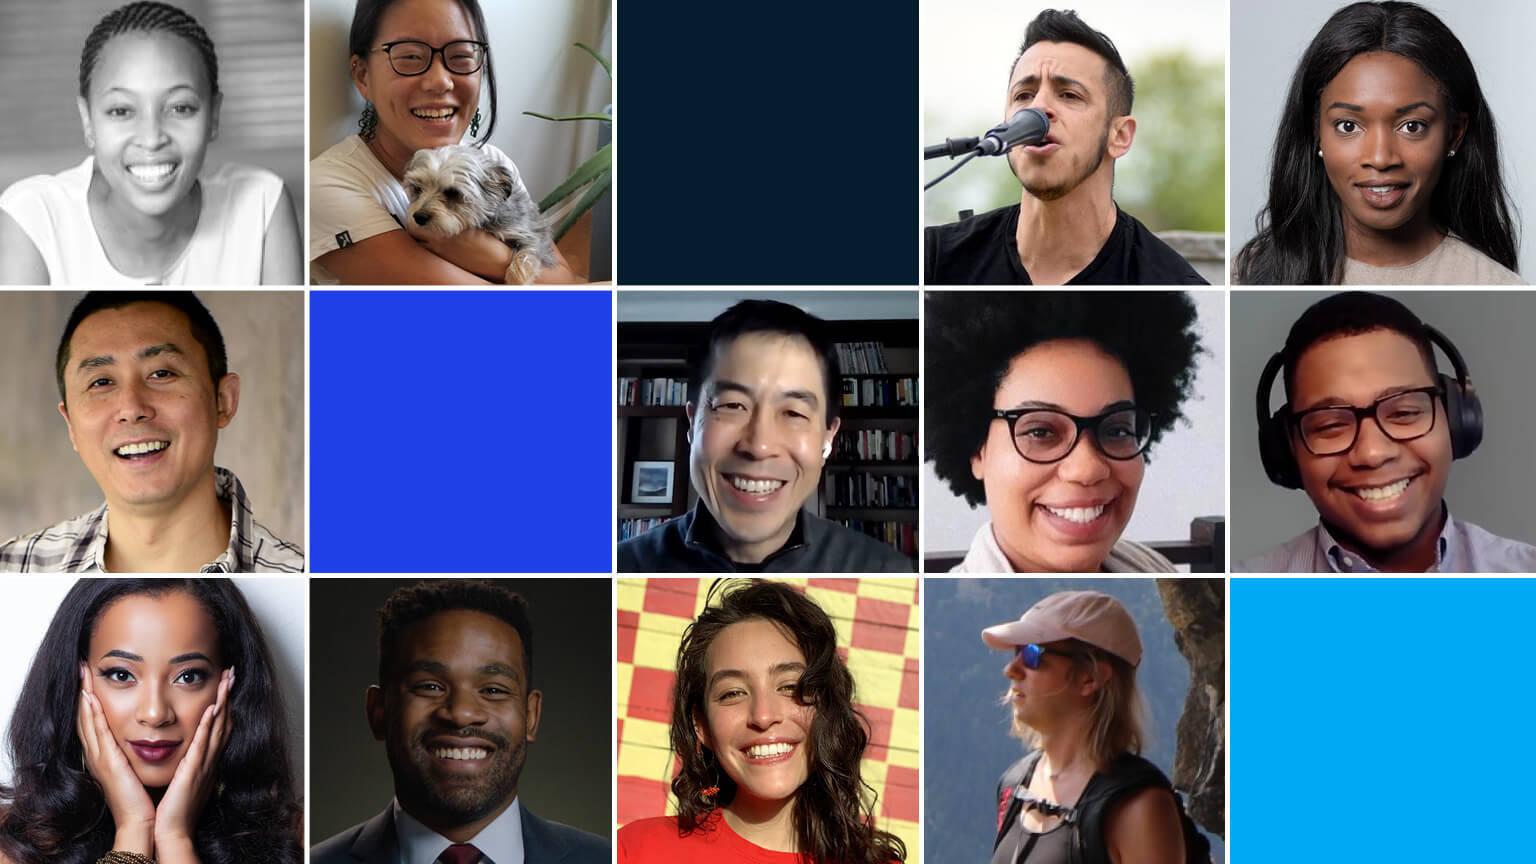 diversity-at-work:-conversations-on-identity